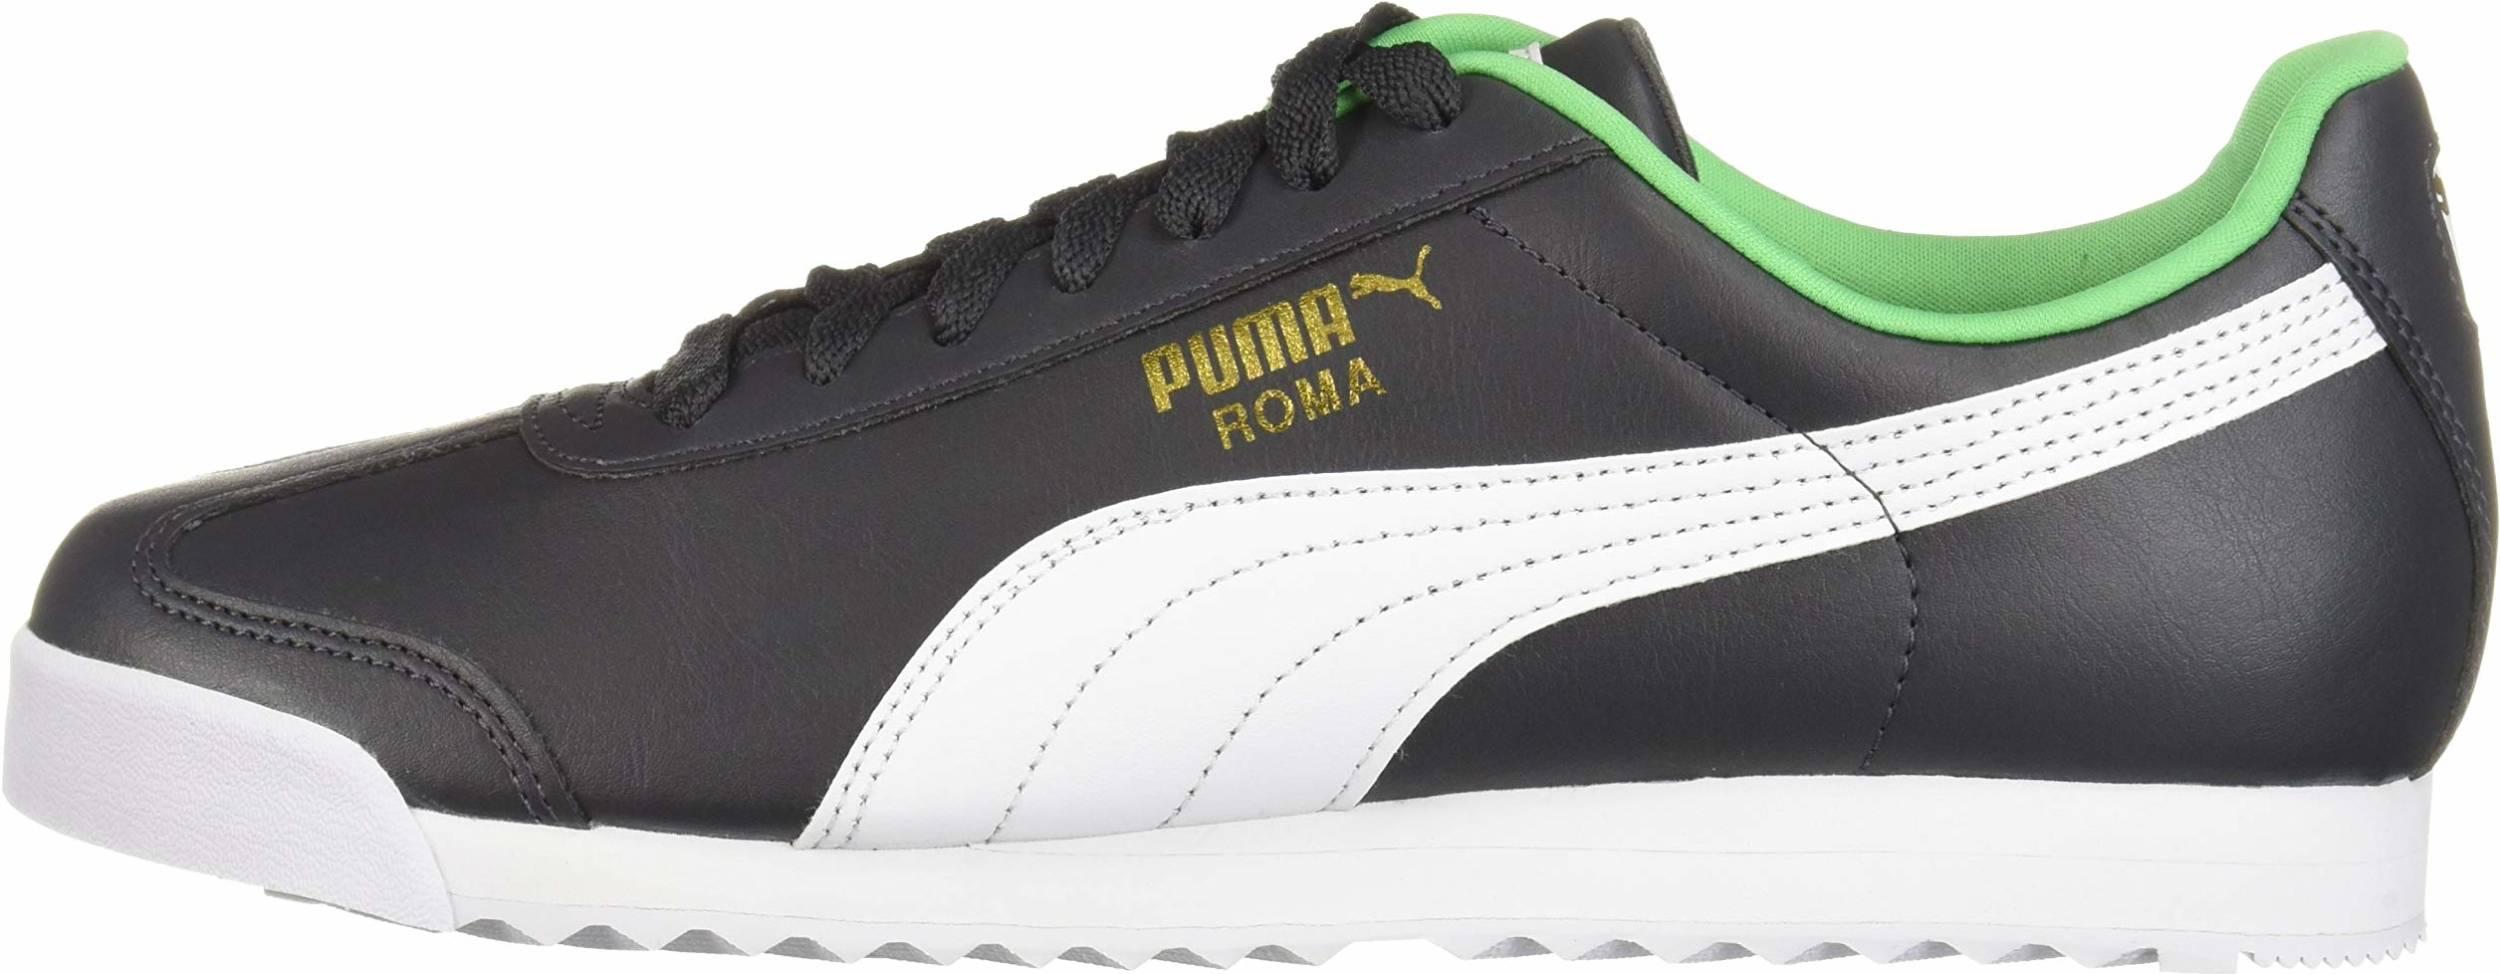 13 Reasons to/NOT to Buy Puma Roma Basic (Sep 2021) | RunRepeat